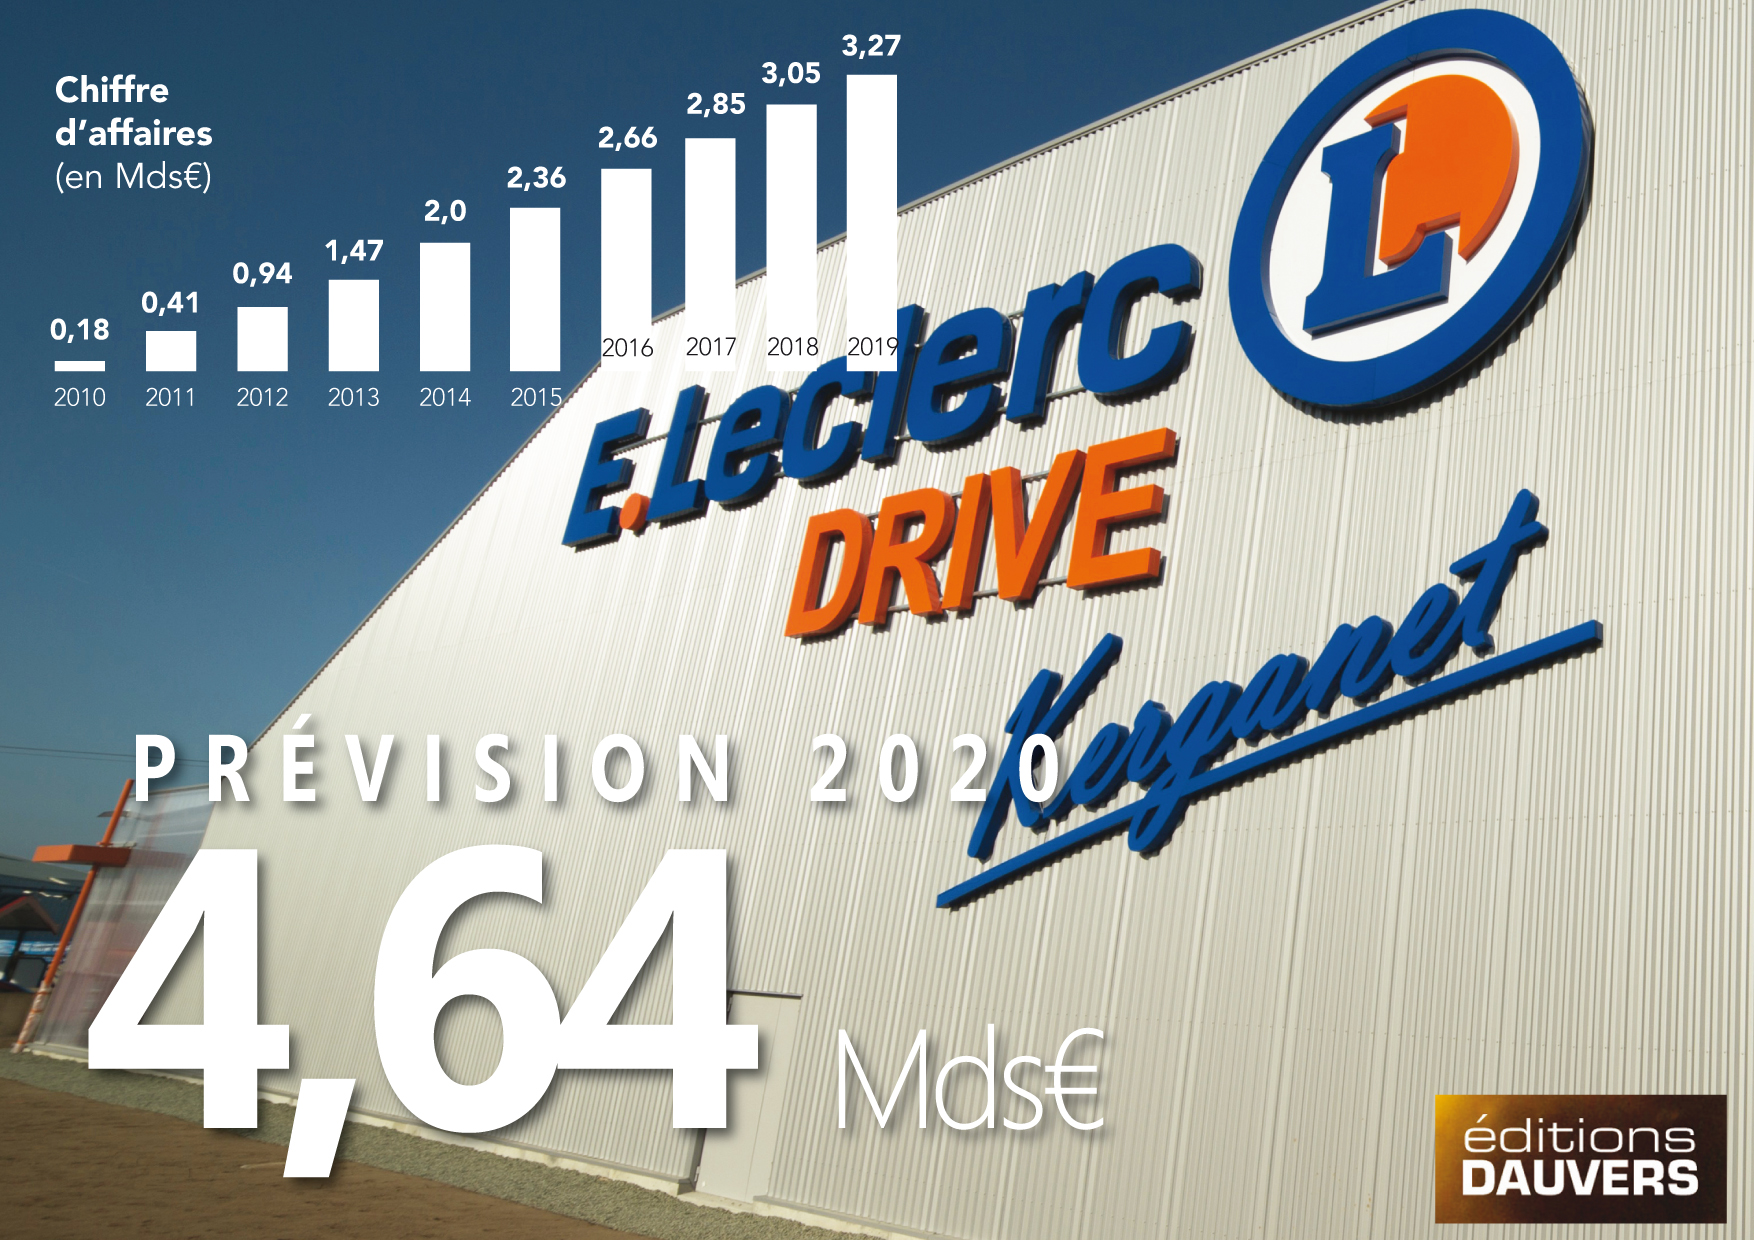 Leclerc Drive CA